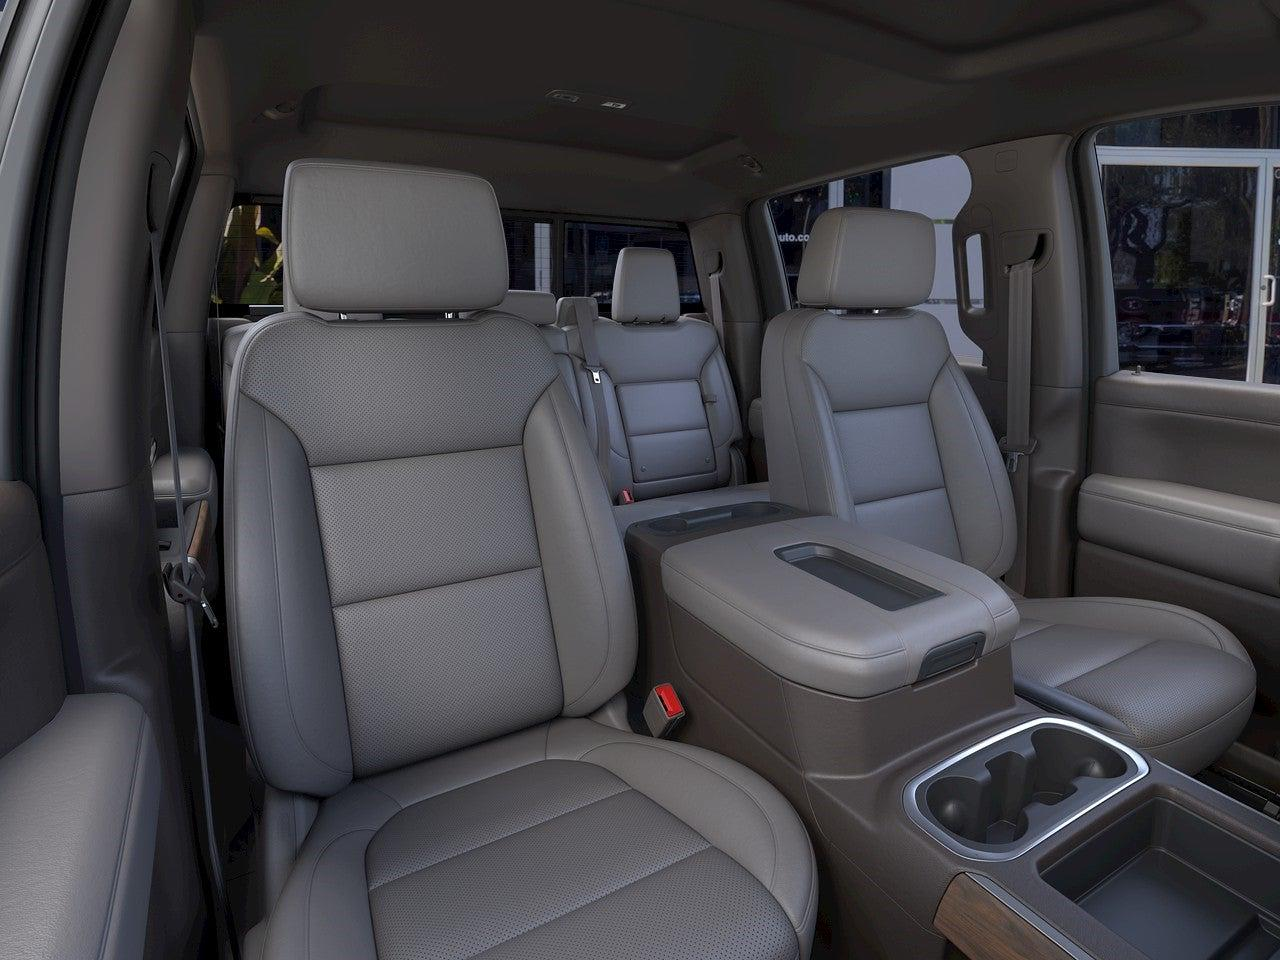 2021 GMC Sierra 1500 Crew Cab 4x4, Pickup #T21422 - photo 33